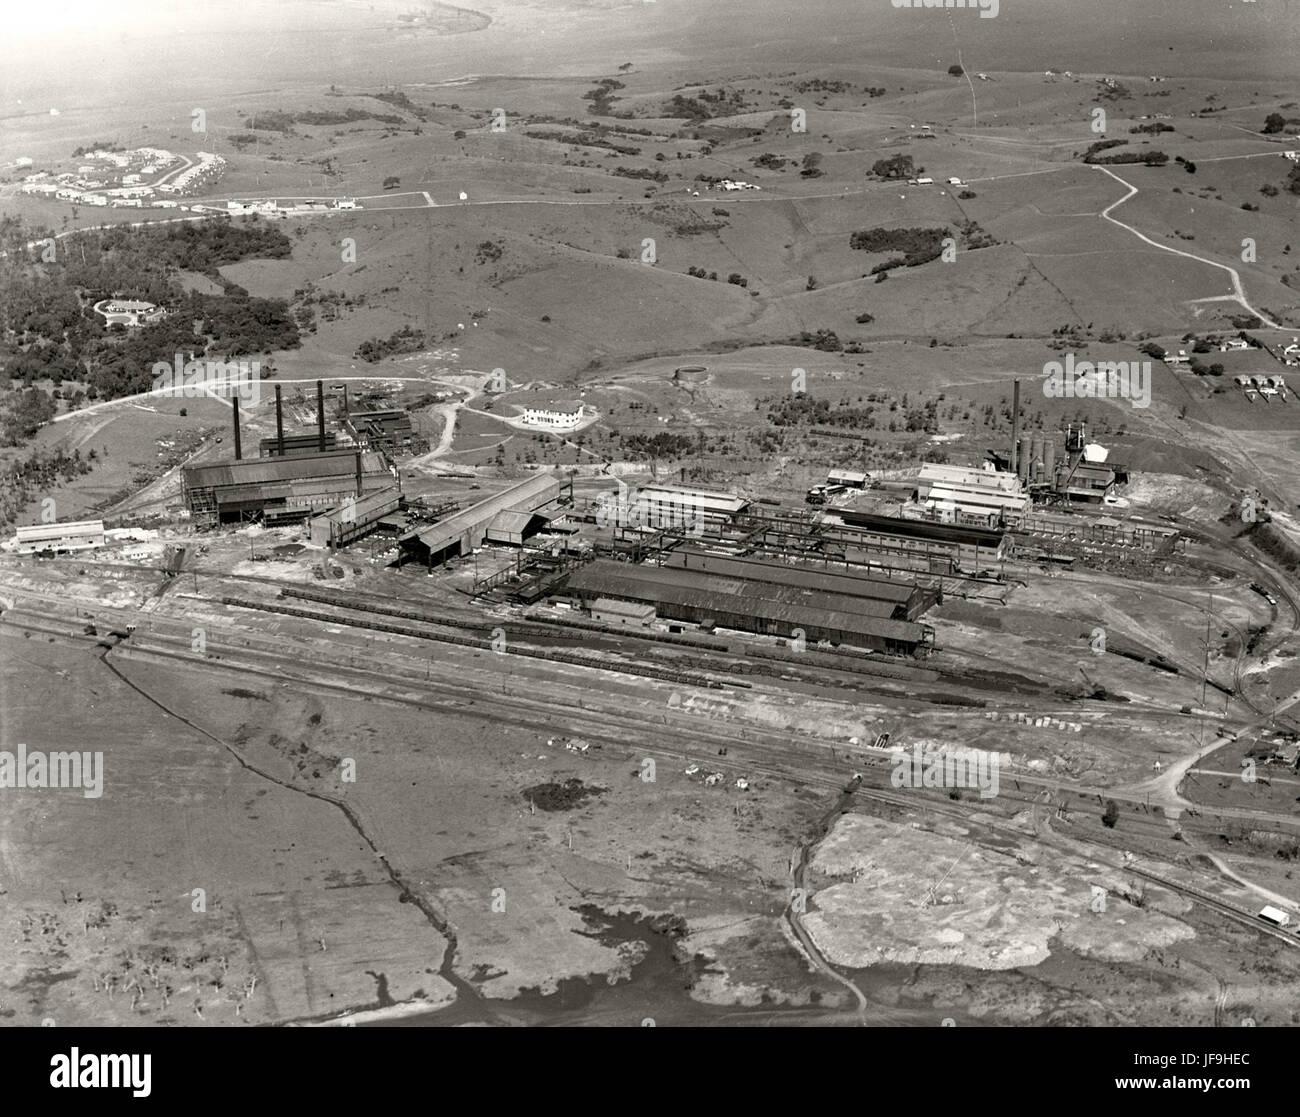 Port Kembla Steel Works  - 1936 29536136663 o - Stock Image